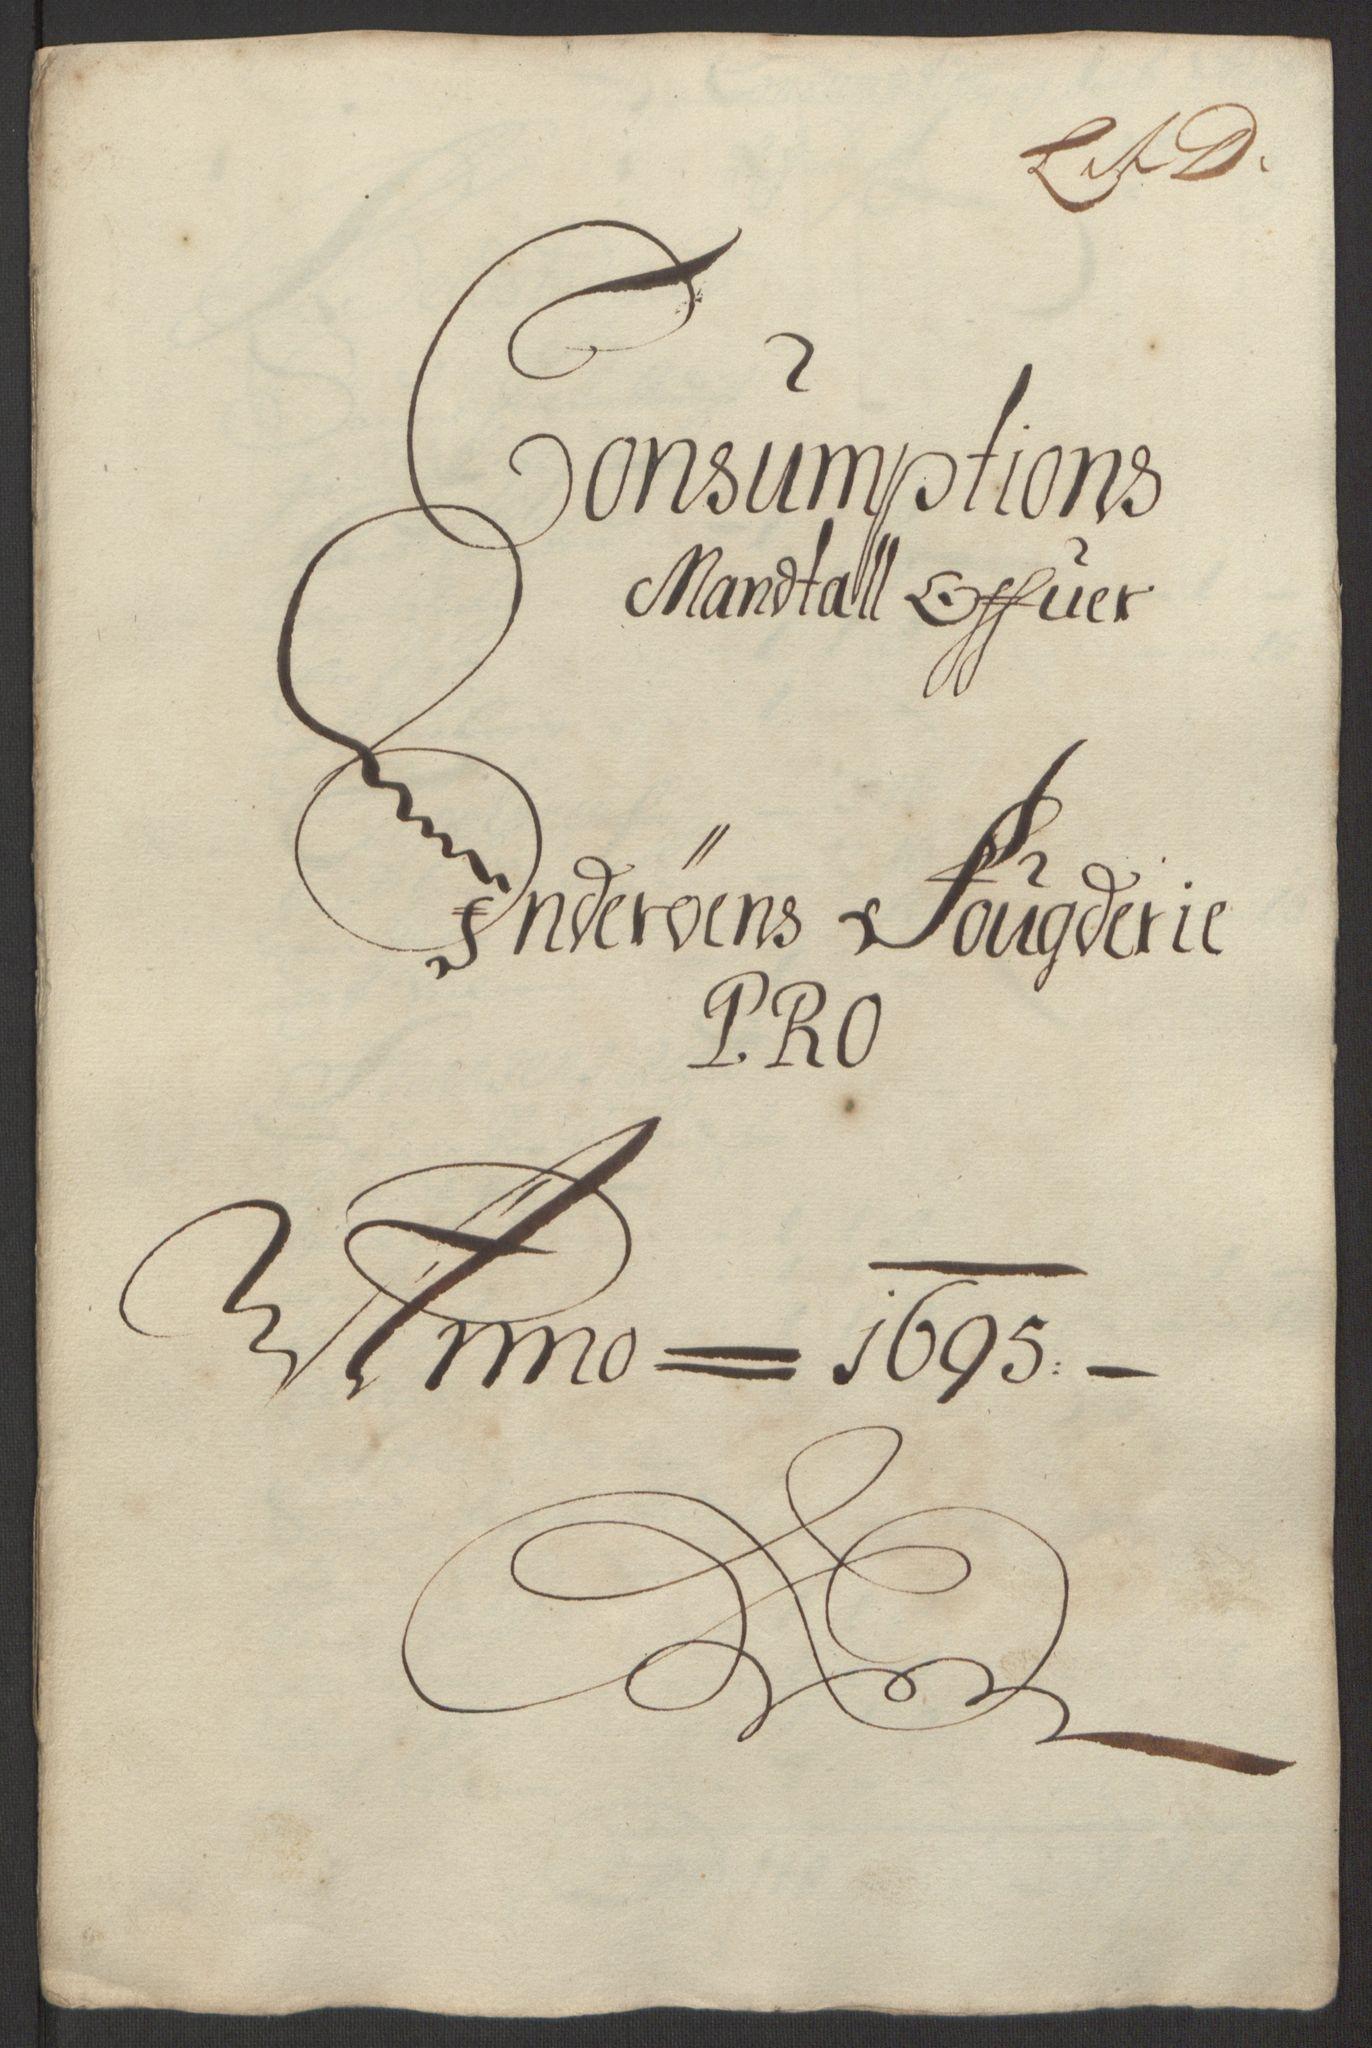 RA, Rentekammeret inntil 1814, Reviderte regnskaper, Fogderegnskap, R63/L4309: Fogderegnskap Inderøy, 1695-1697, s. 32